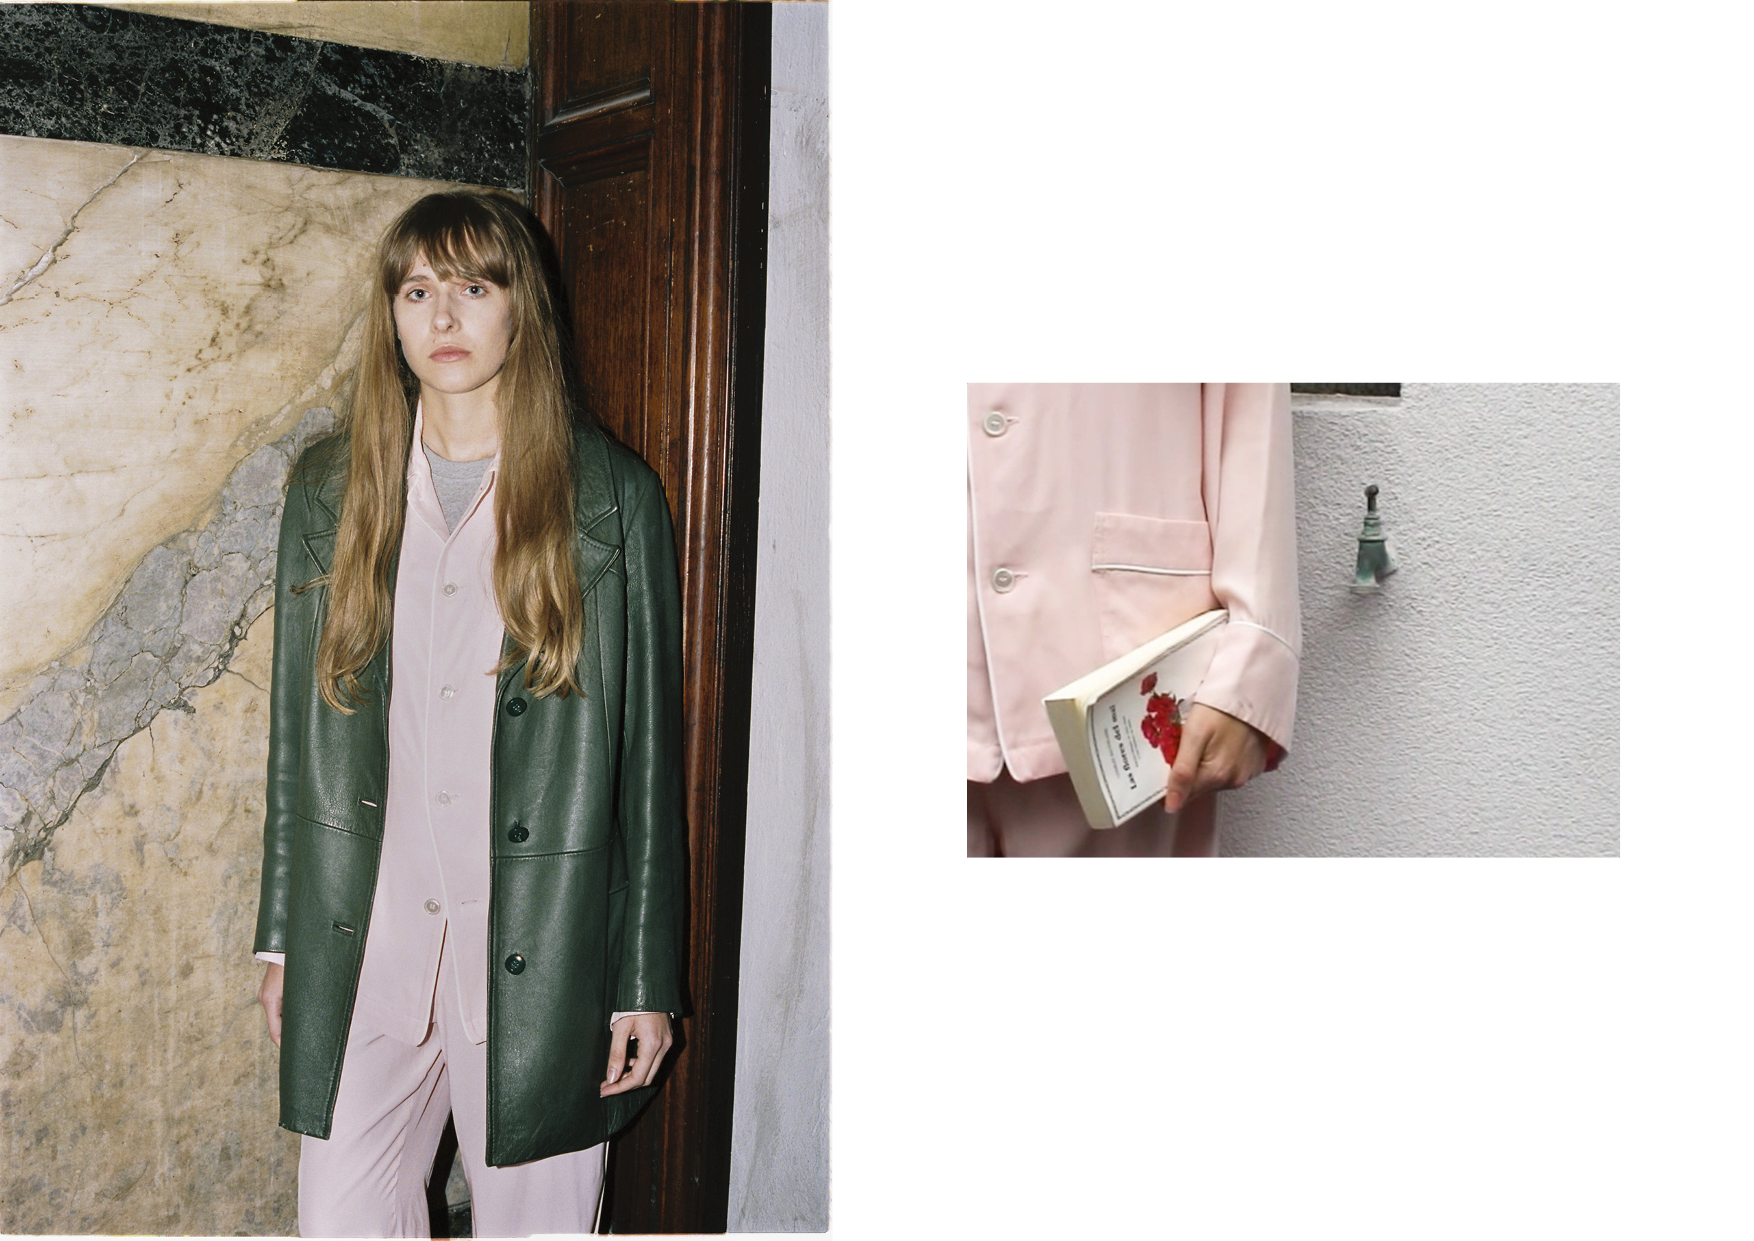 Silk nightwear shirt and trousers OLATZ, cotton t-shirt LEVI'S, green leather jacket stylist archive